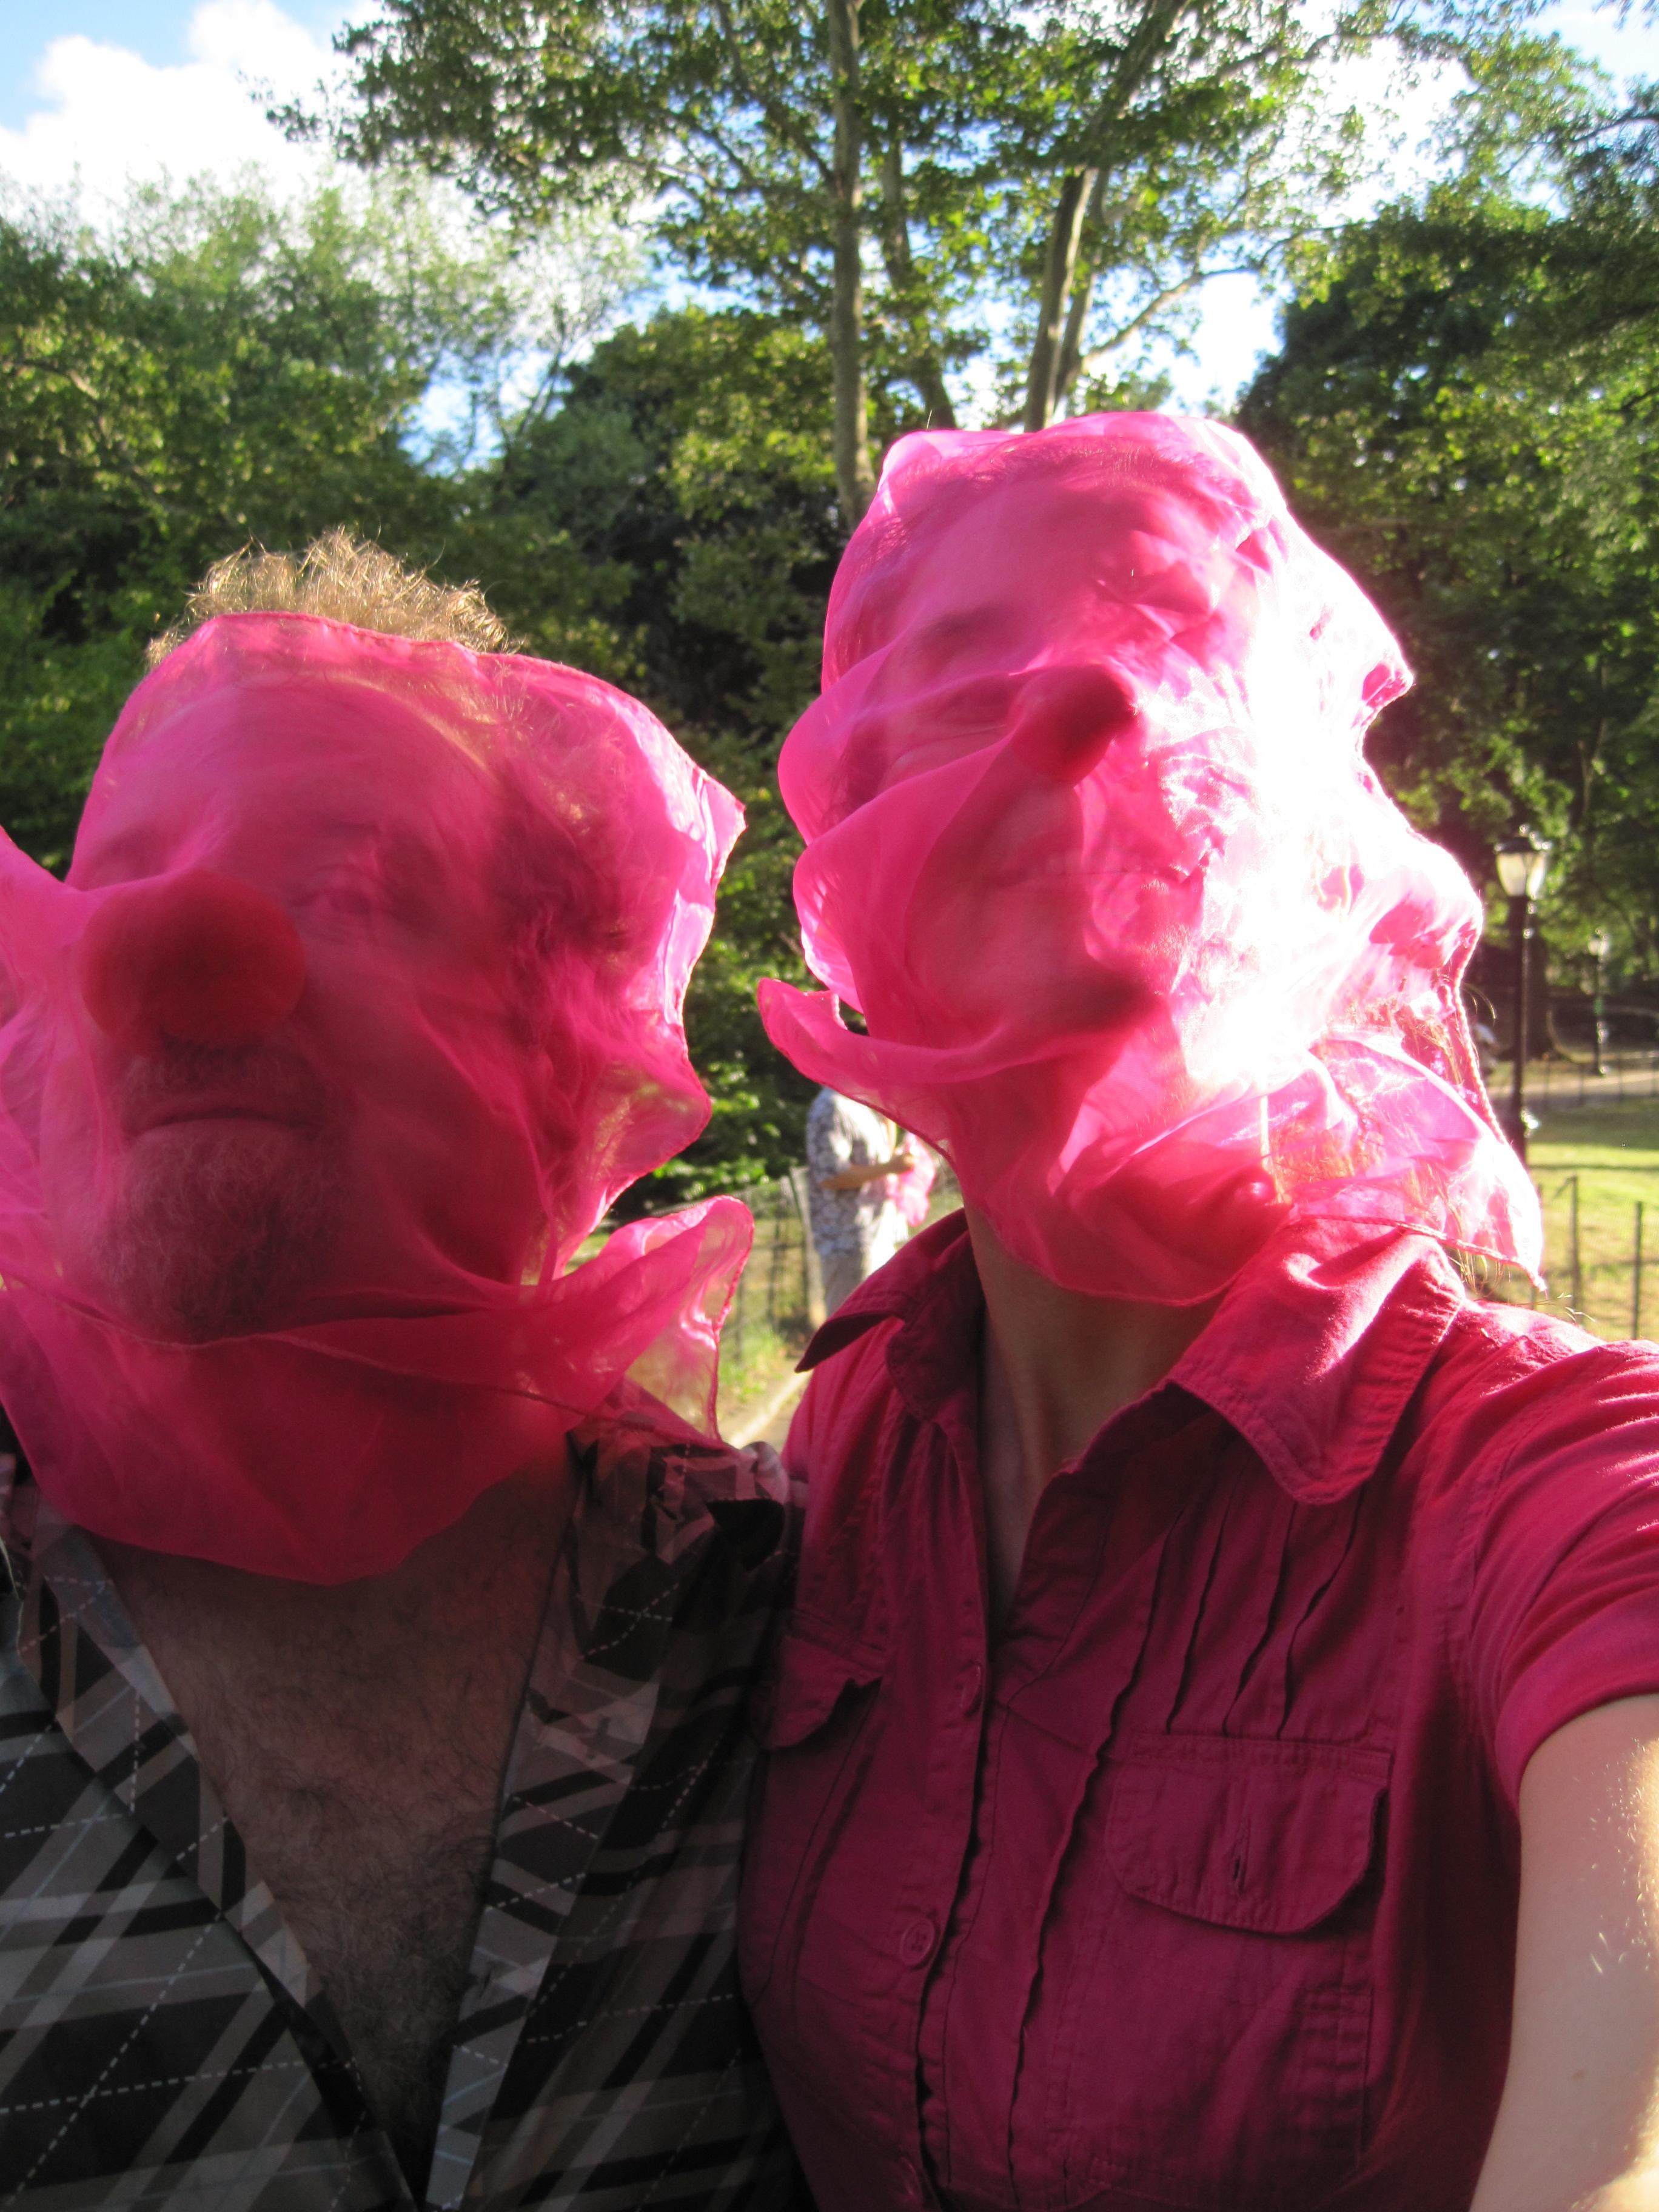 clown curious pink faces